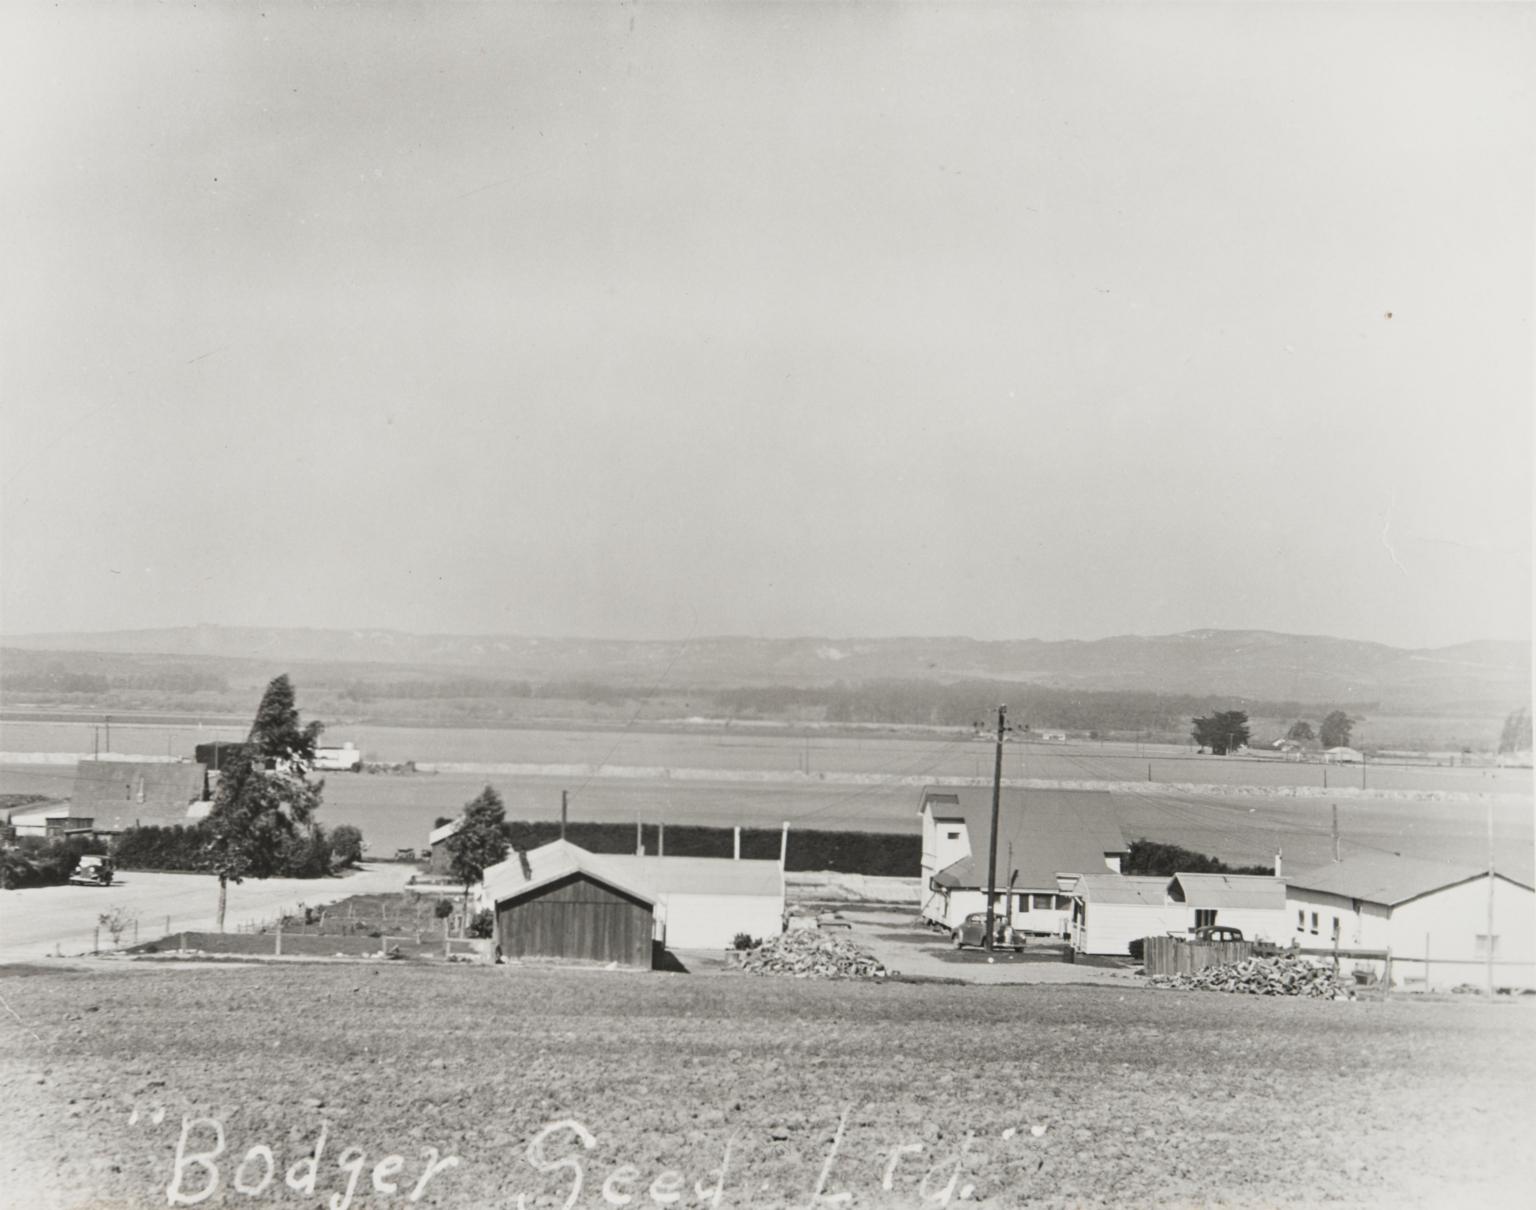 Farm workers housing - Lompoc.